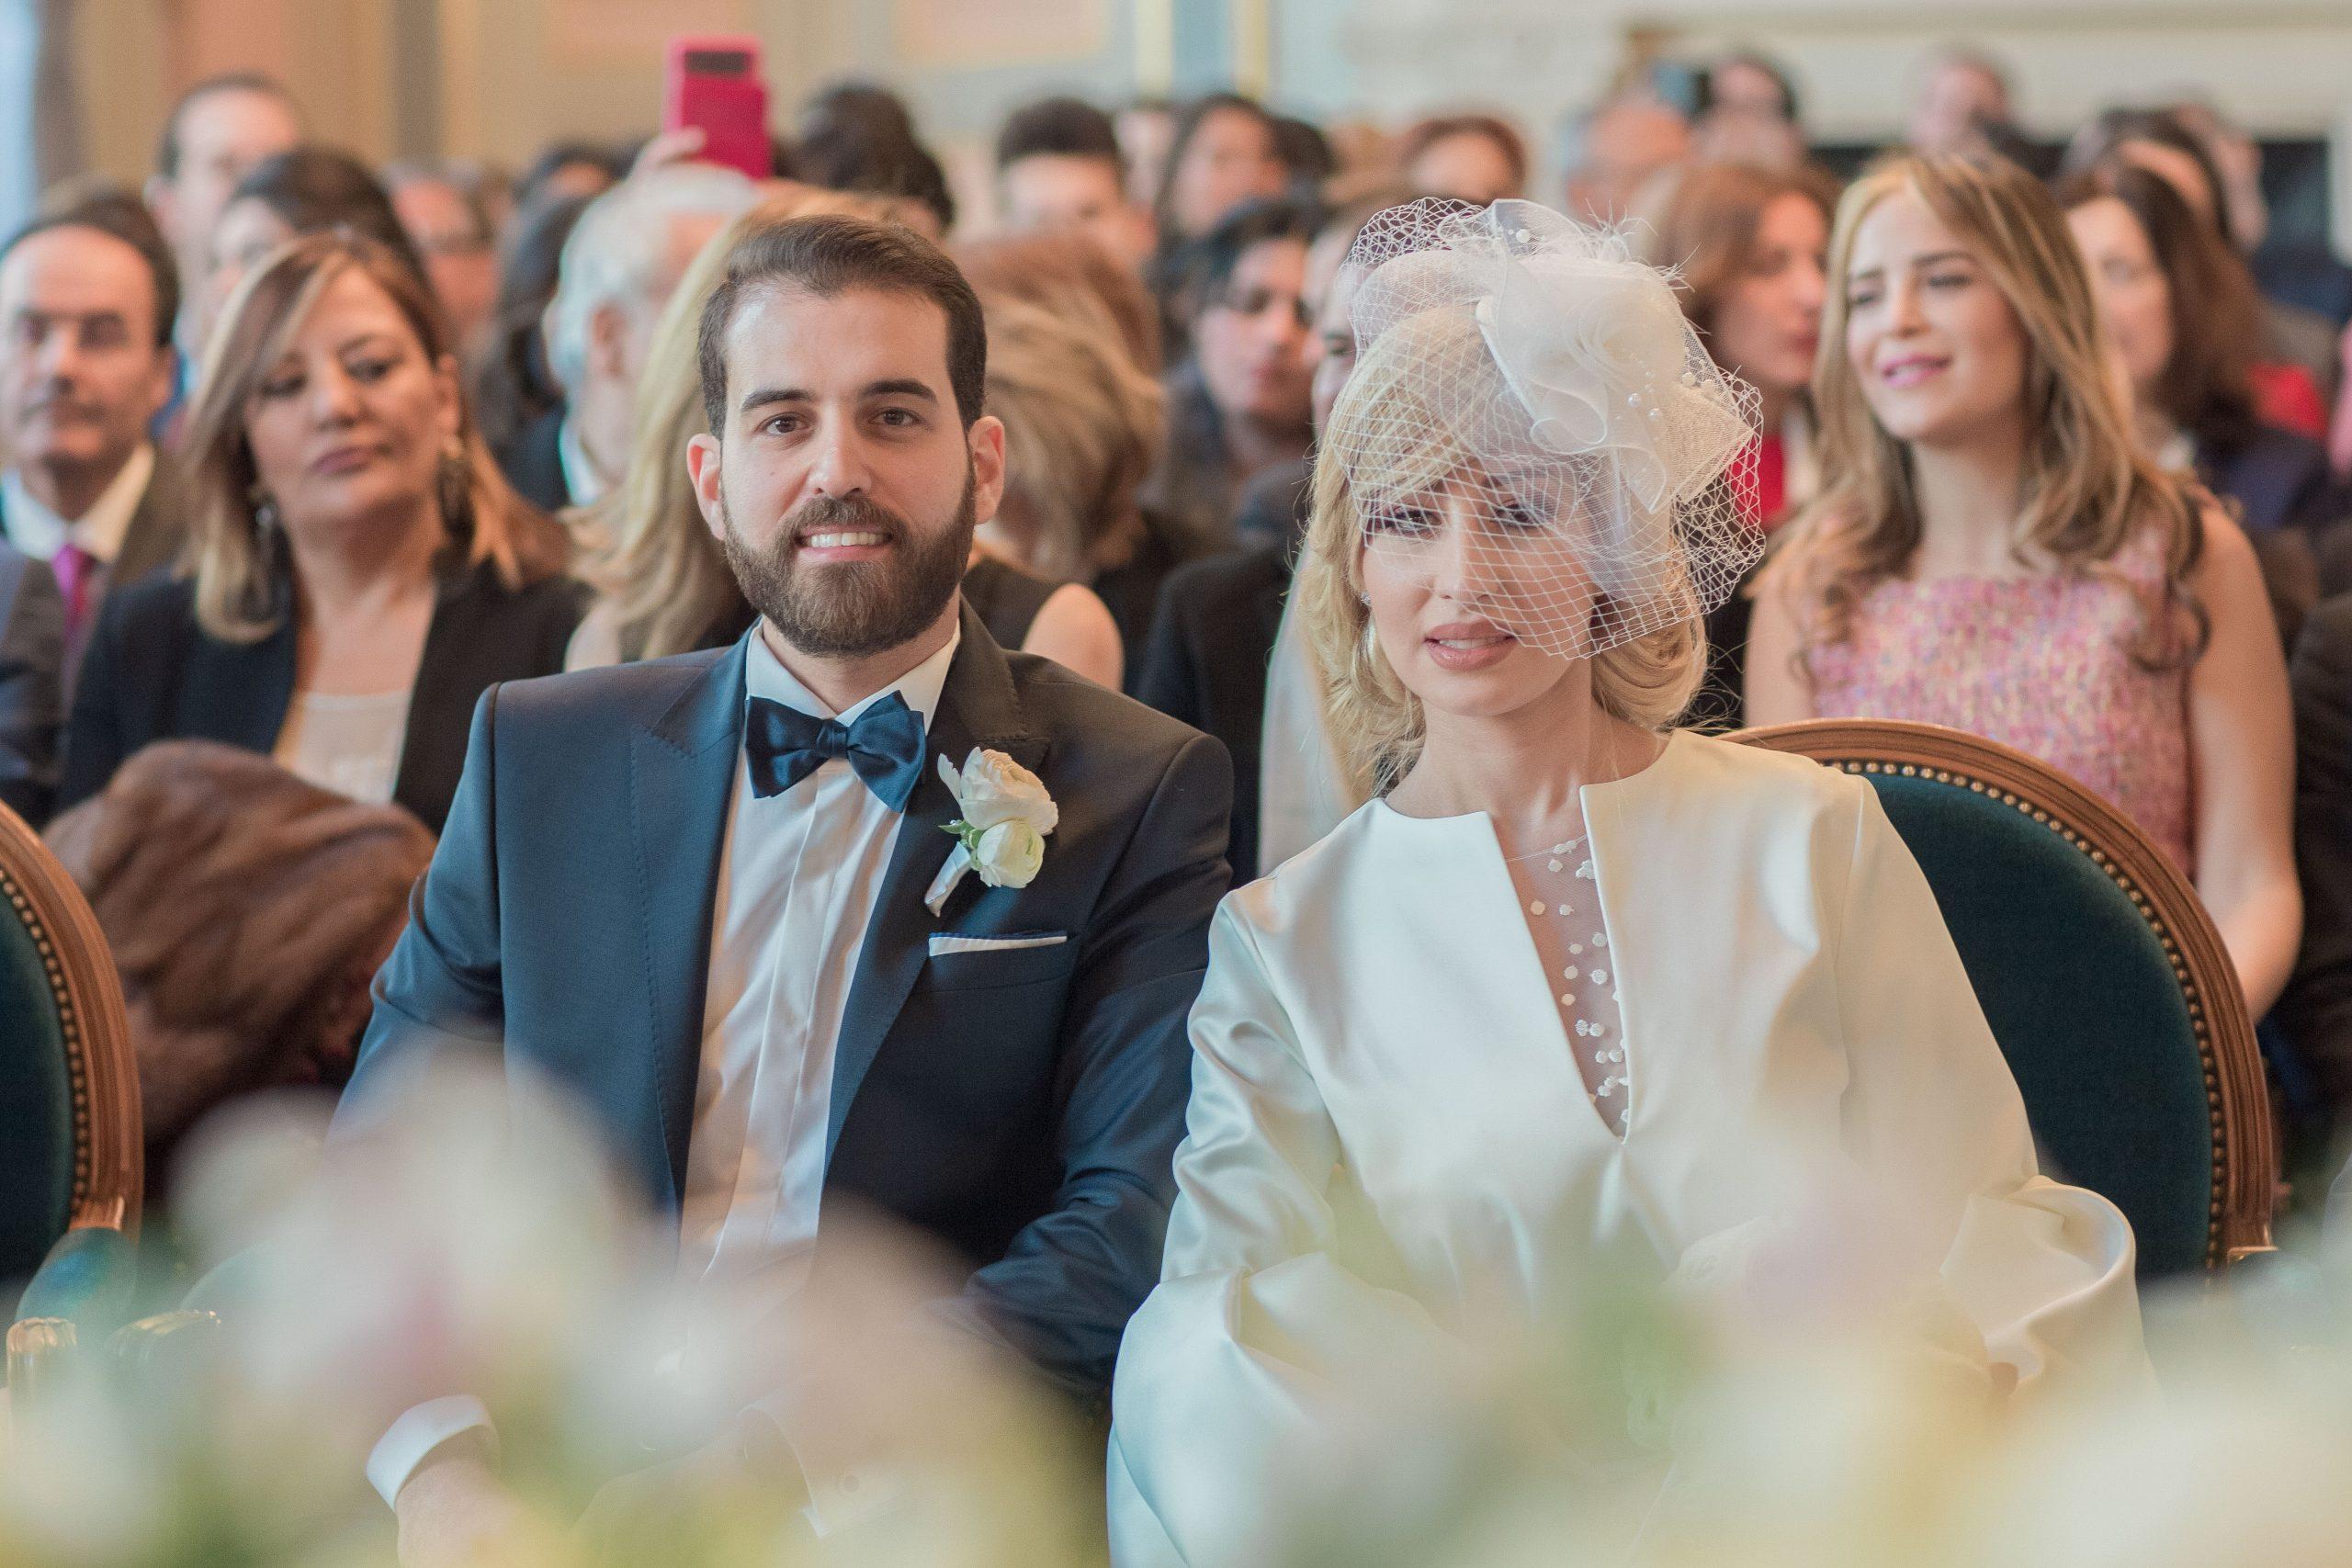 photographe-mariage-ceremonie-civile-paris16